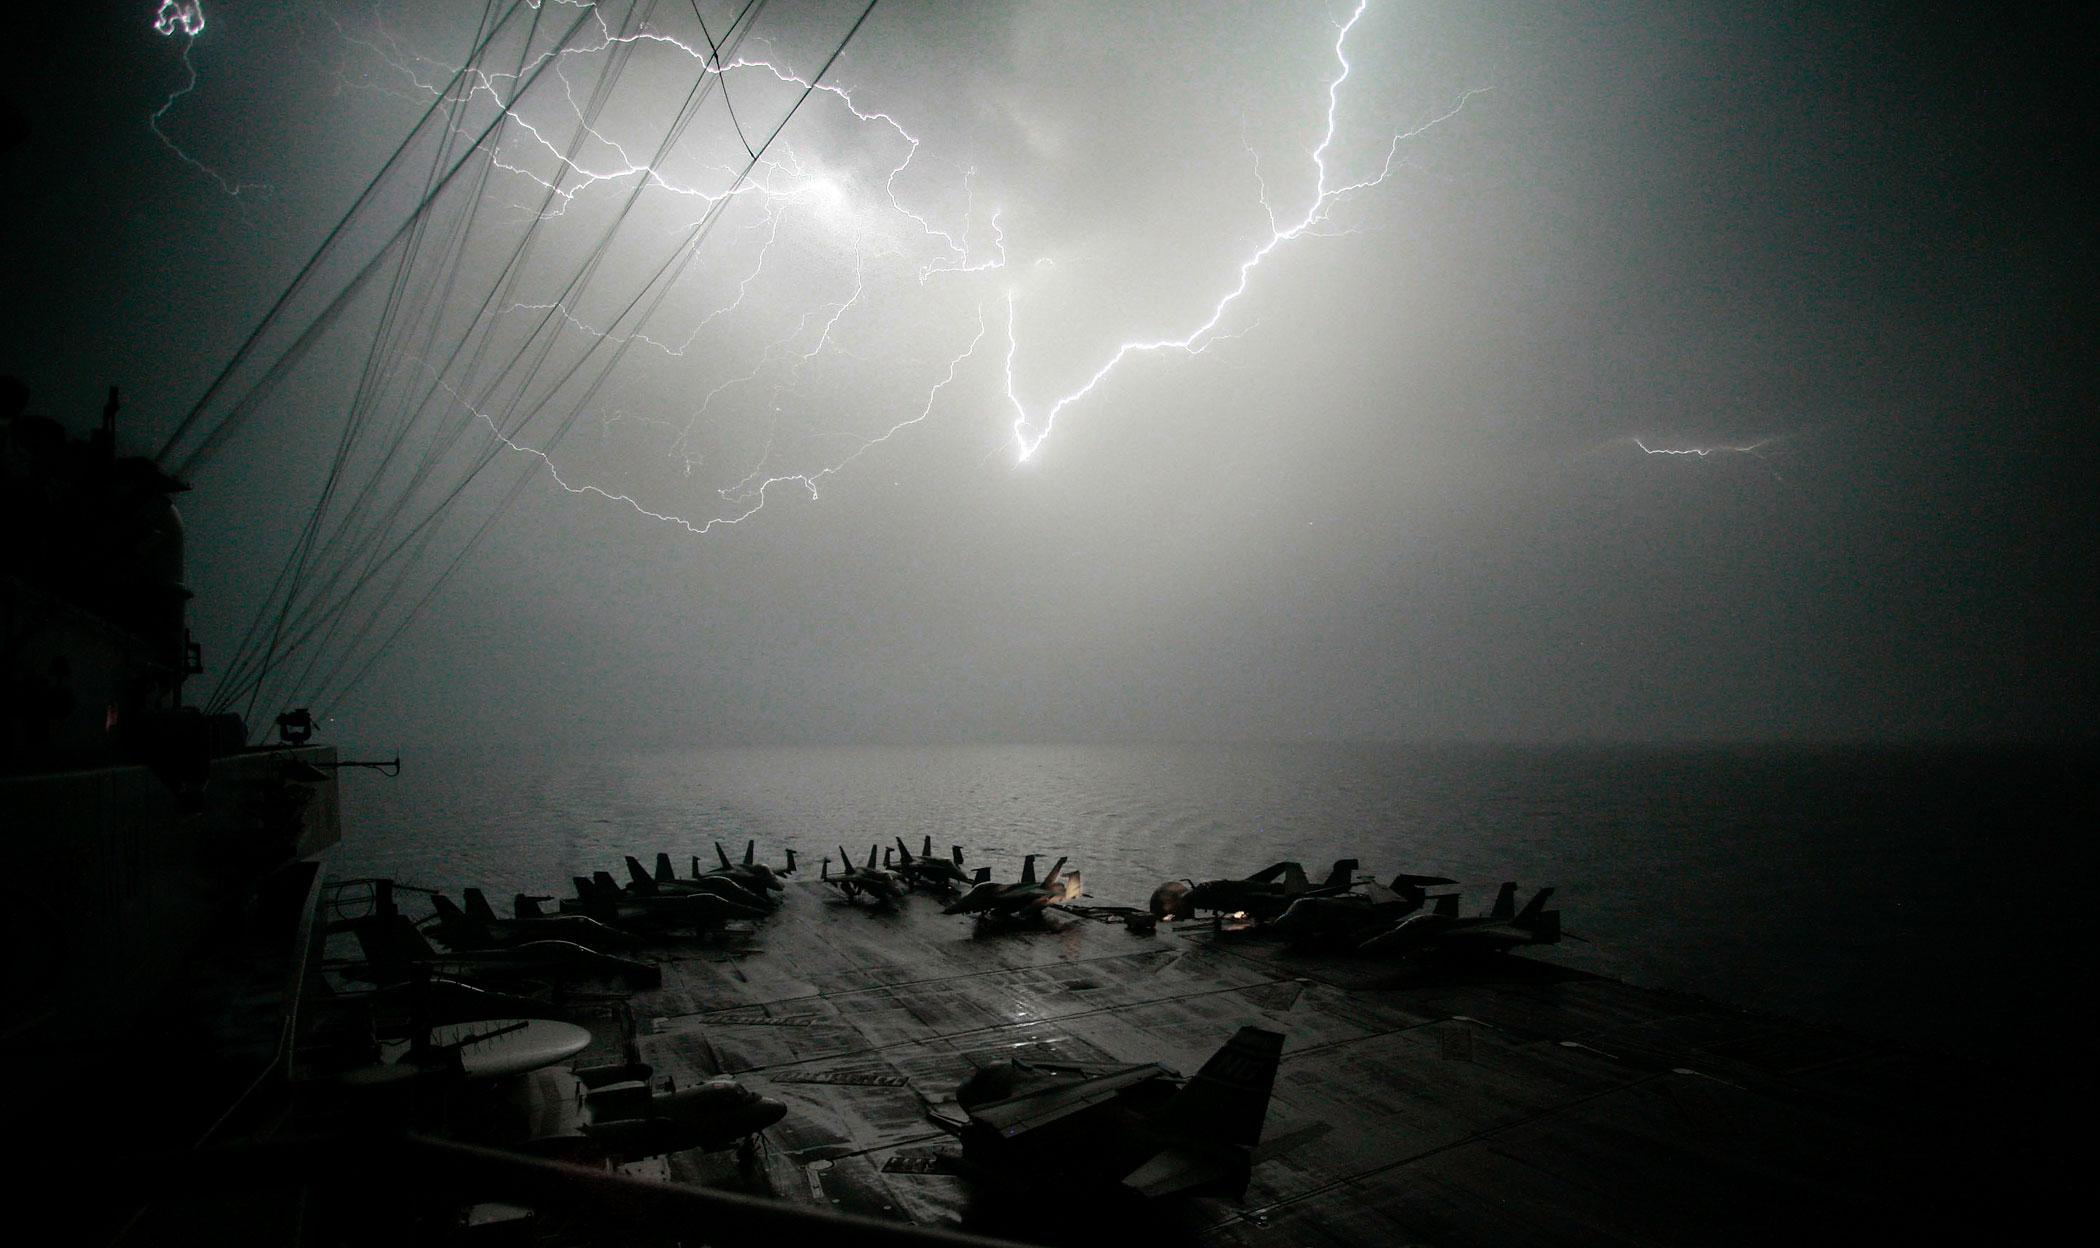 Lightning strikes over the flight deck of the Nimitz-class aircraft carrier USS John C. Stennis (CVN 74) as the ship transits through the Persian Gulf, March 28, 2007.